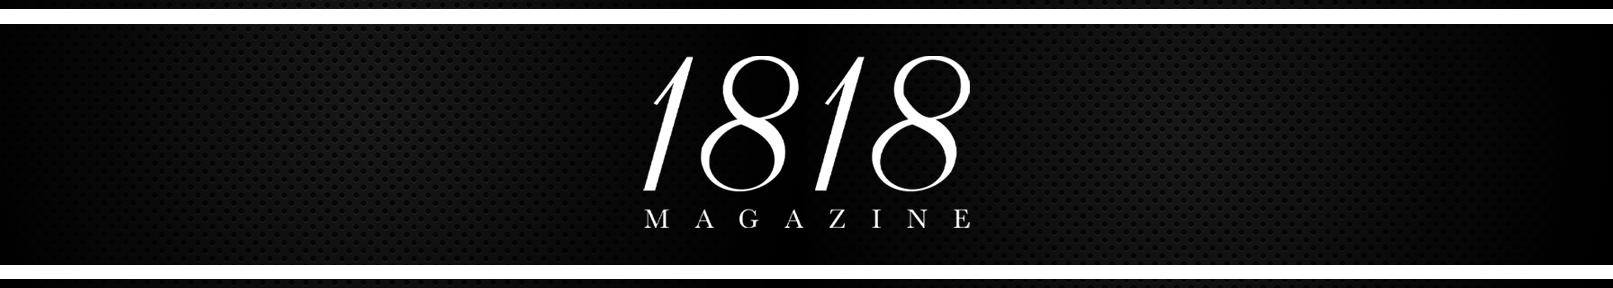 1818 magazine logo